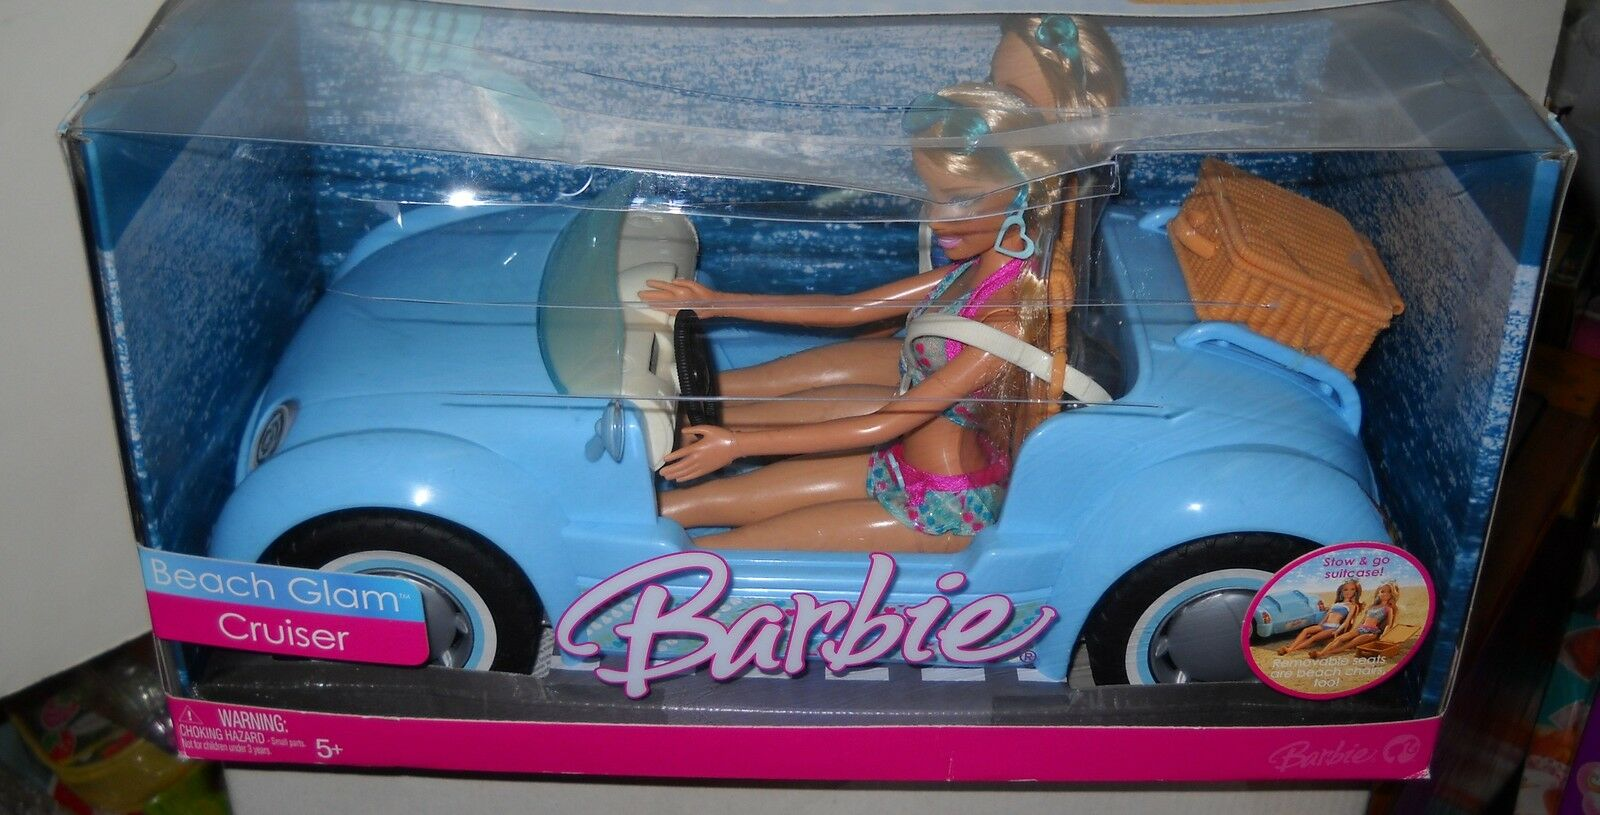 Nuevo En Caja Mattel Beach Glam Cruiser con 2 muñecas